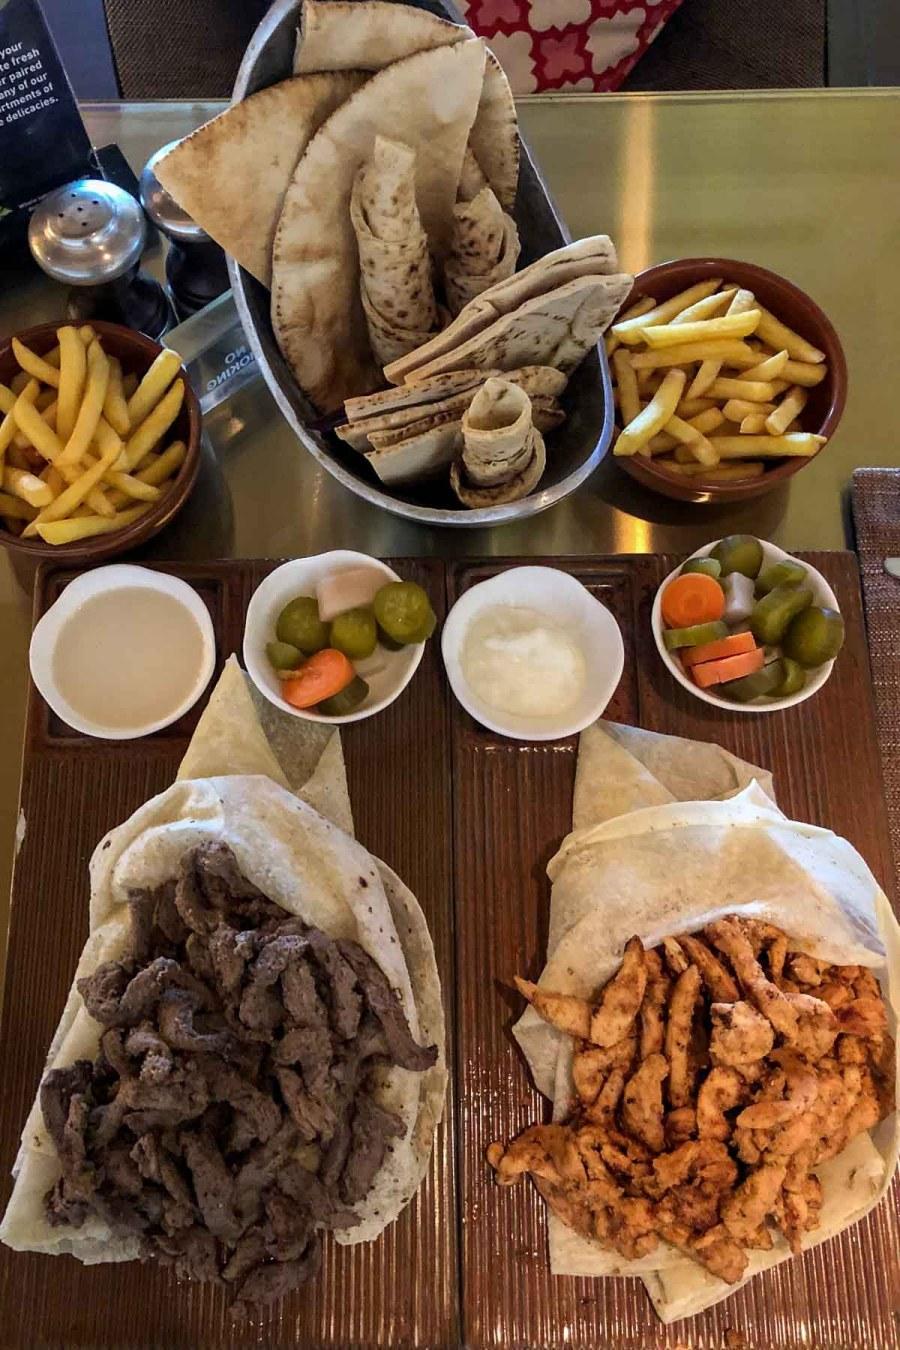 Lunch at the Hilton Dead Sea Resort & Spa